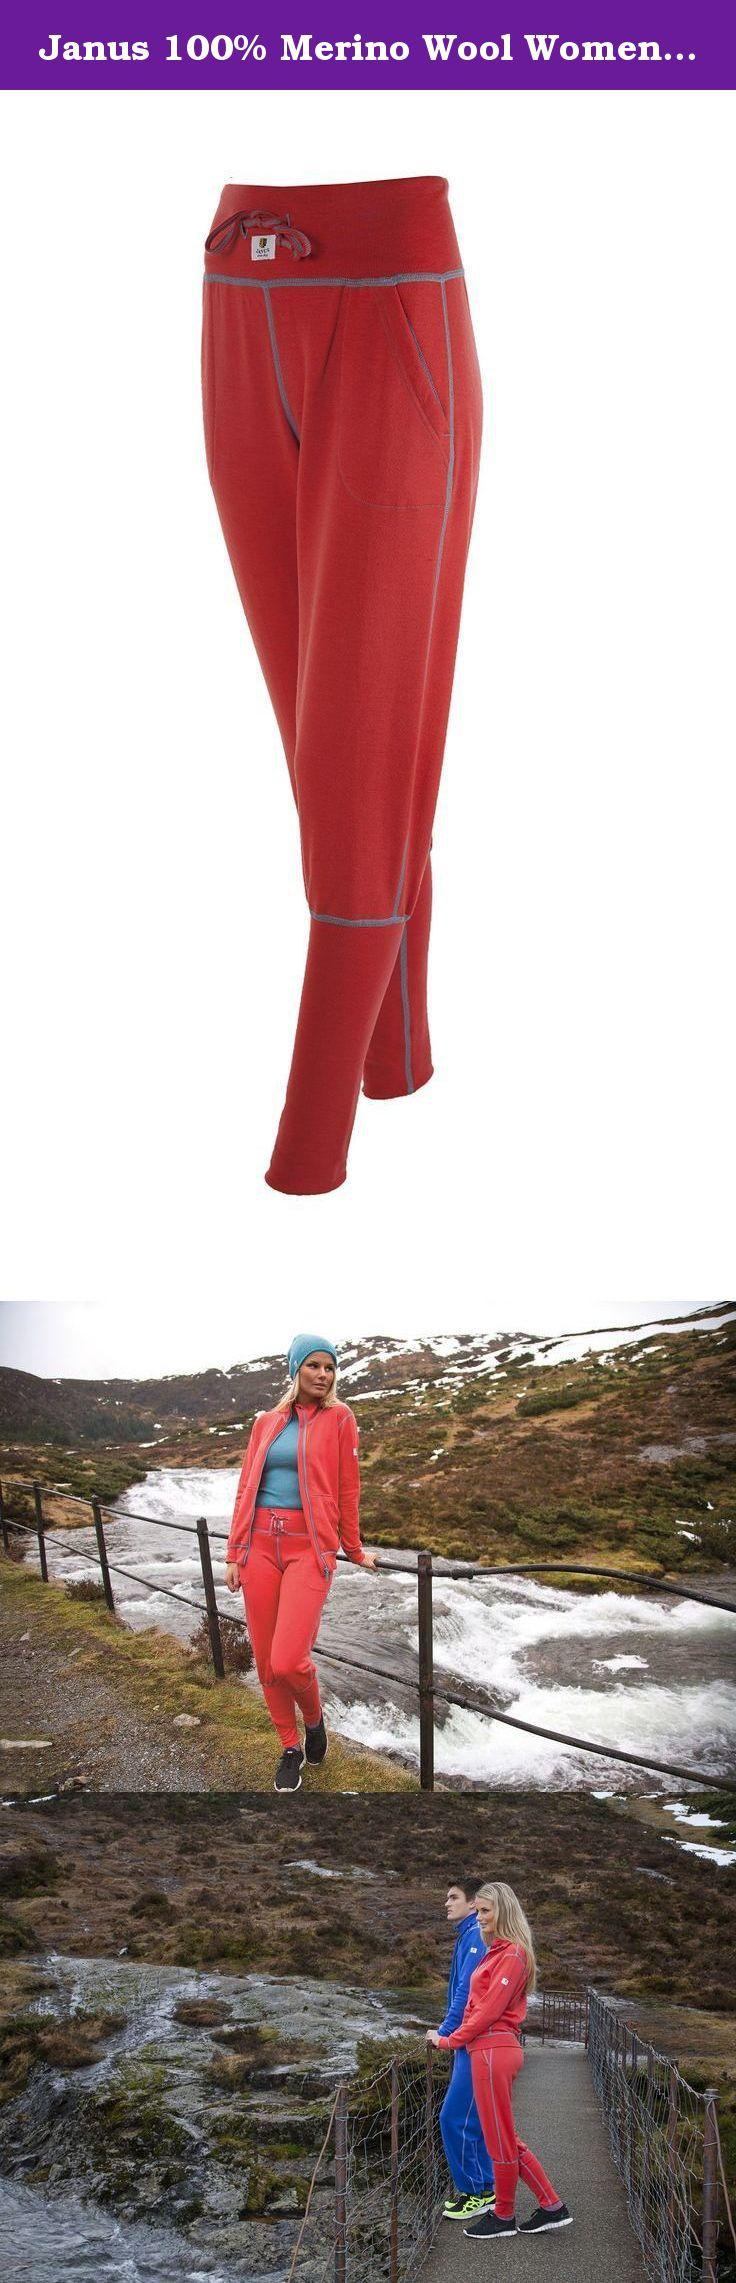 bcf1d385d89 Janus 100% Merino Wool Women's Pants Machine Washable Made in Norway  (Medium, Coral